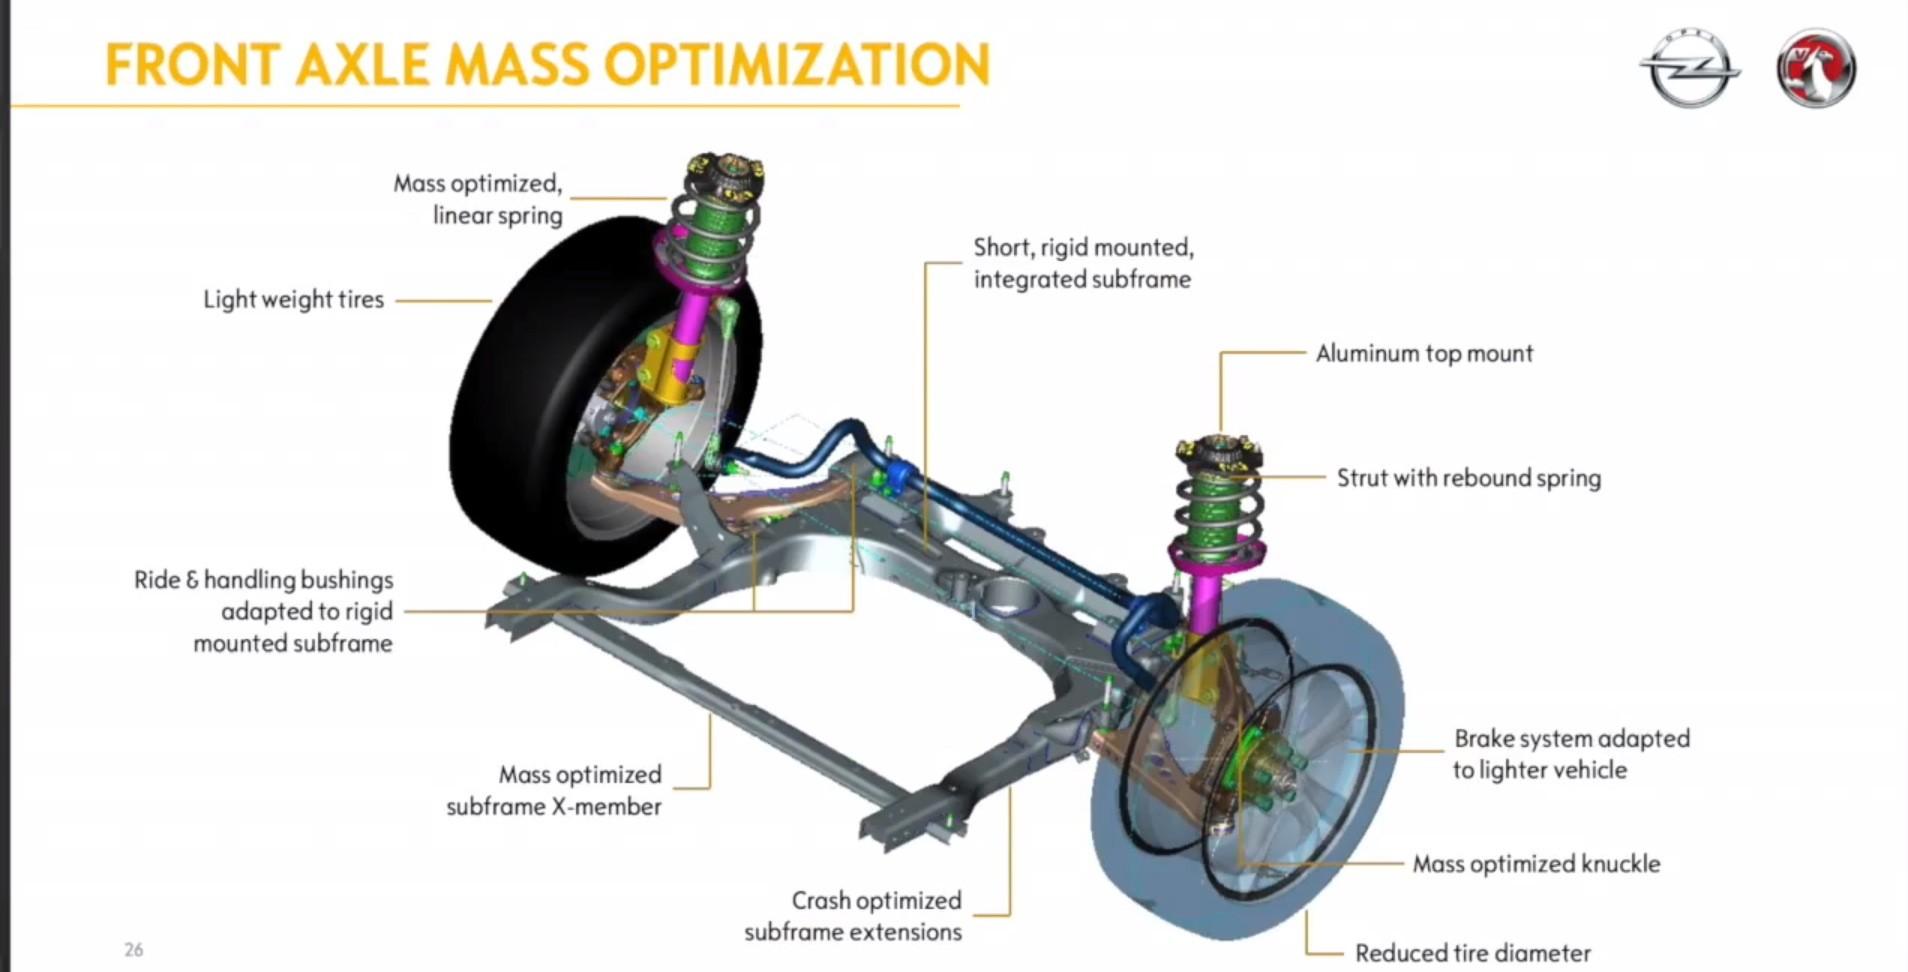 opel astra k test footage details emerge 145 hp 1 4 turbo torsion beam suspension